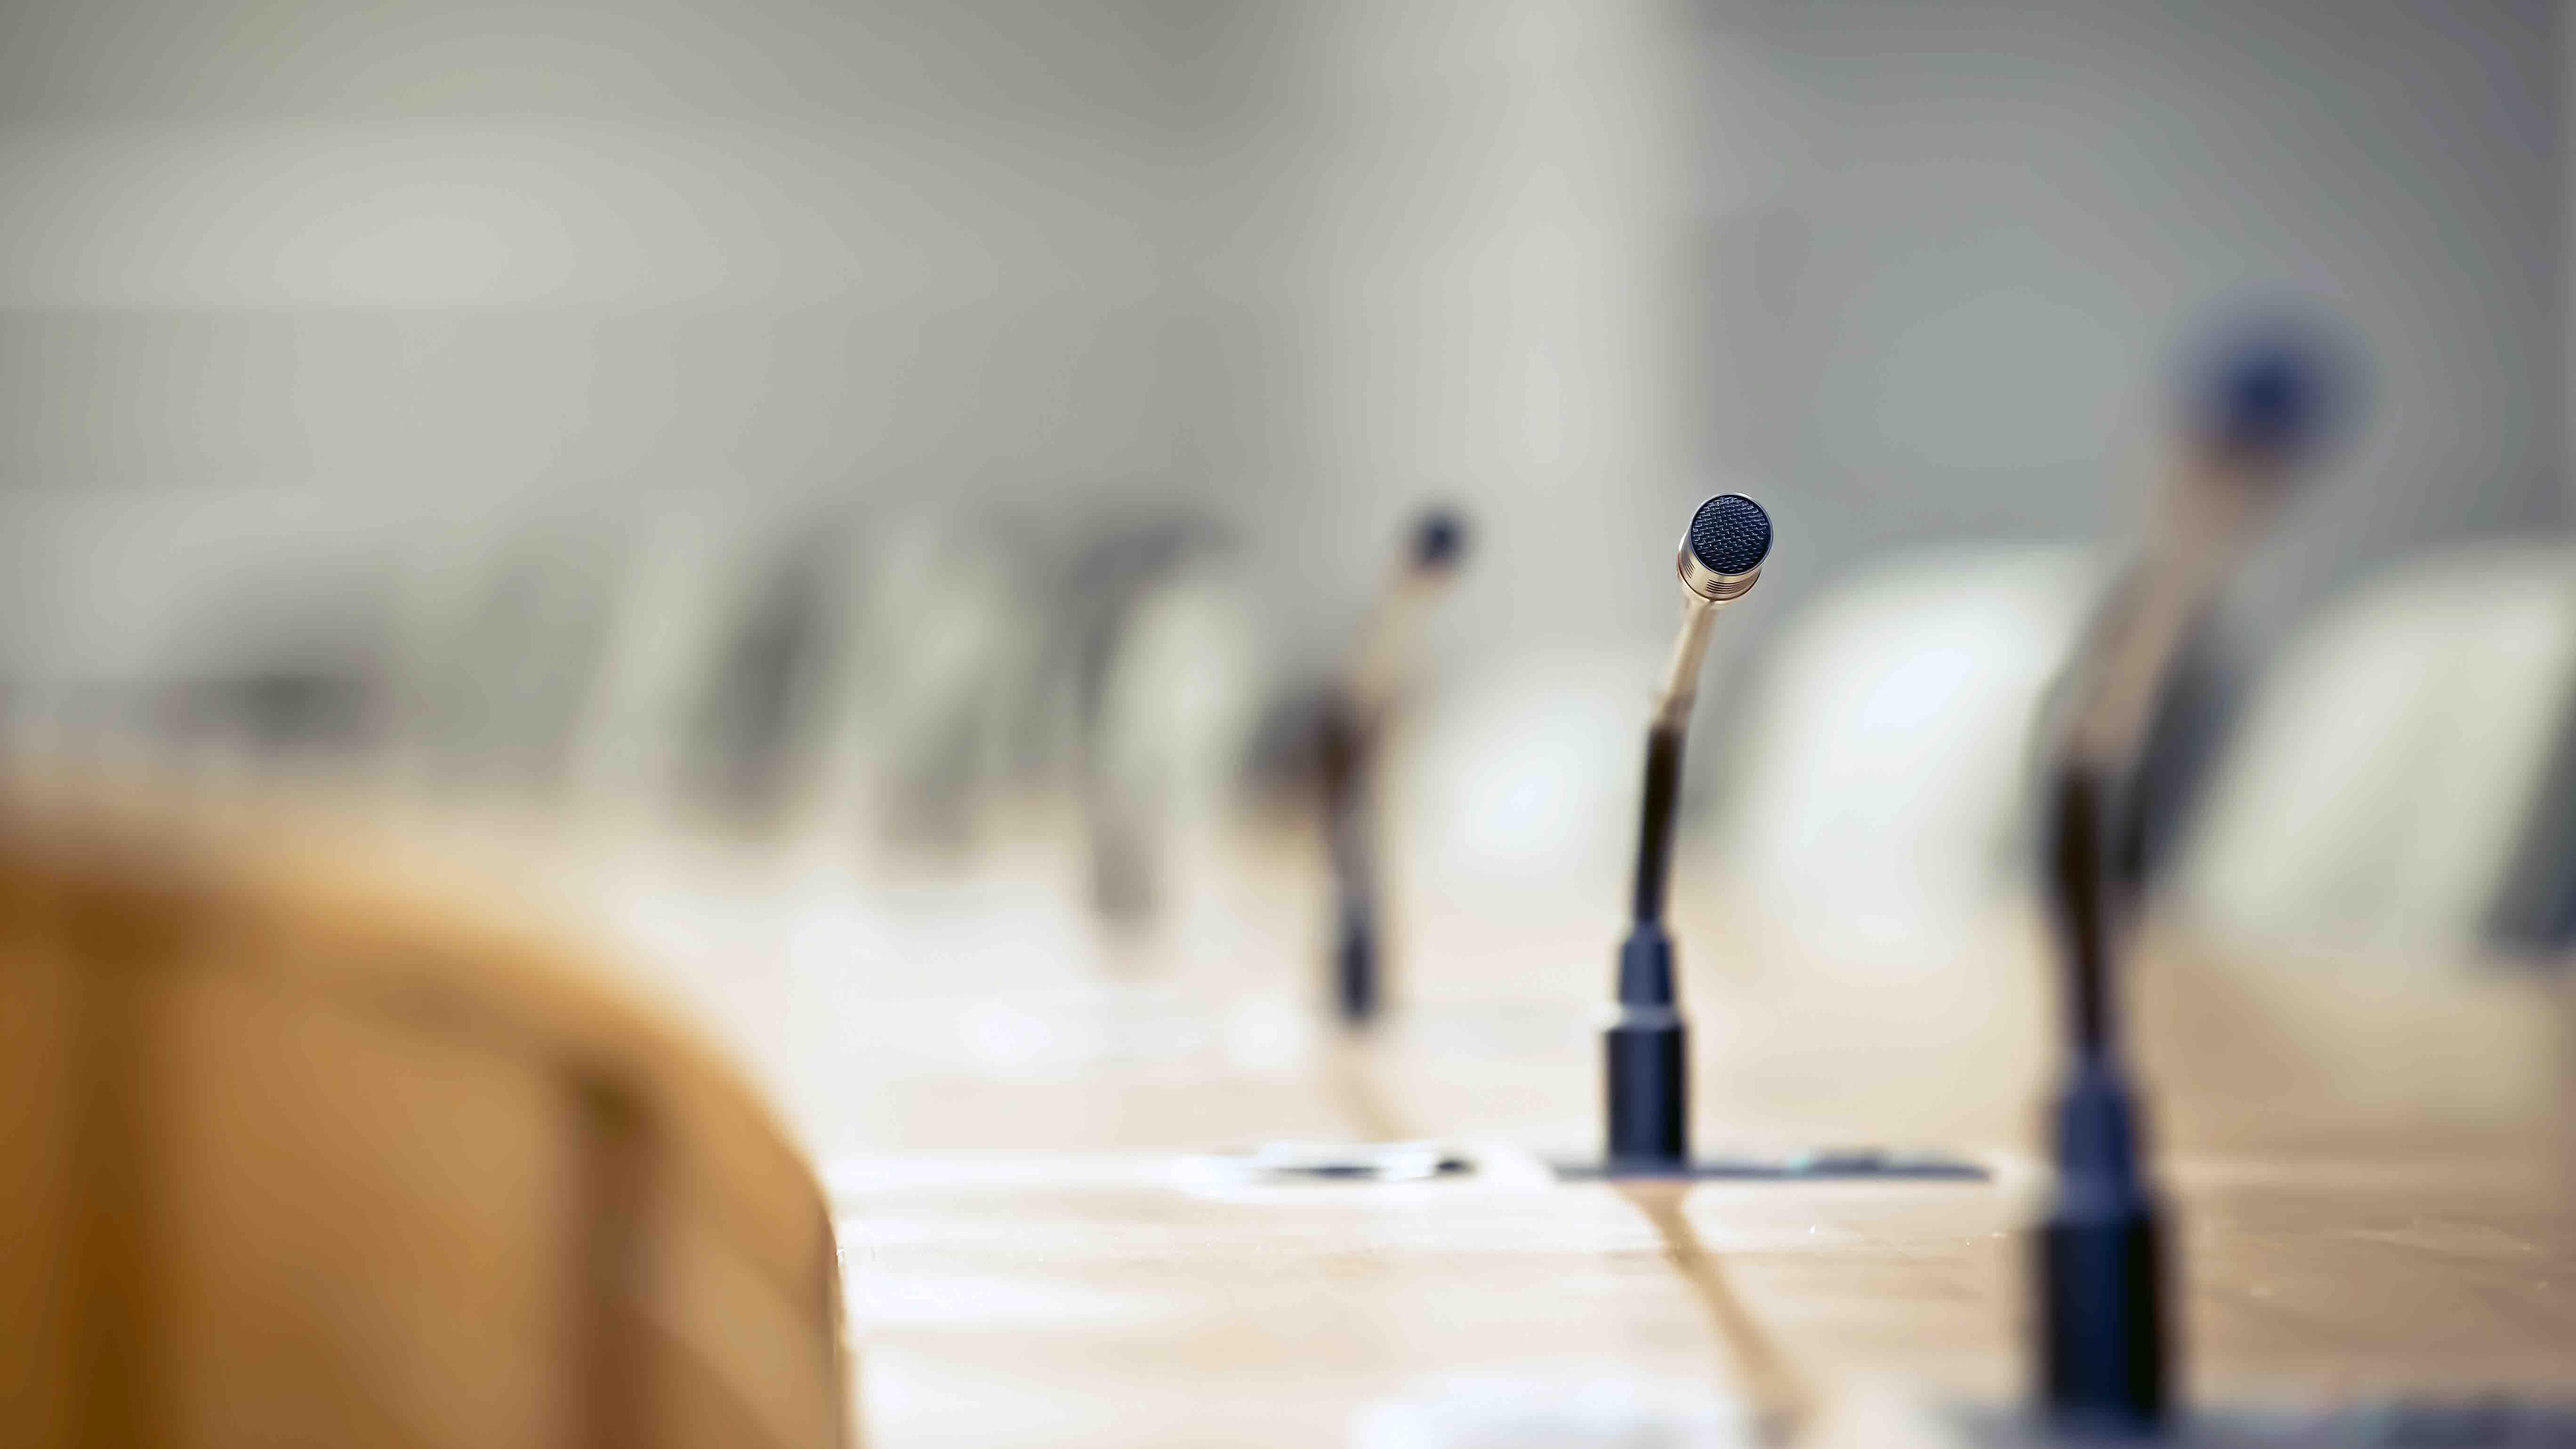 bigstock-Closeup-Conference-Microphones-382000550